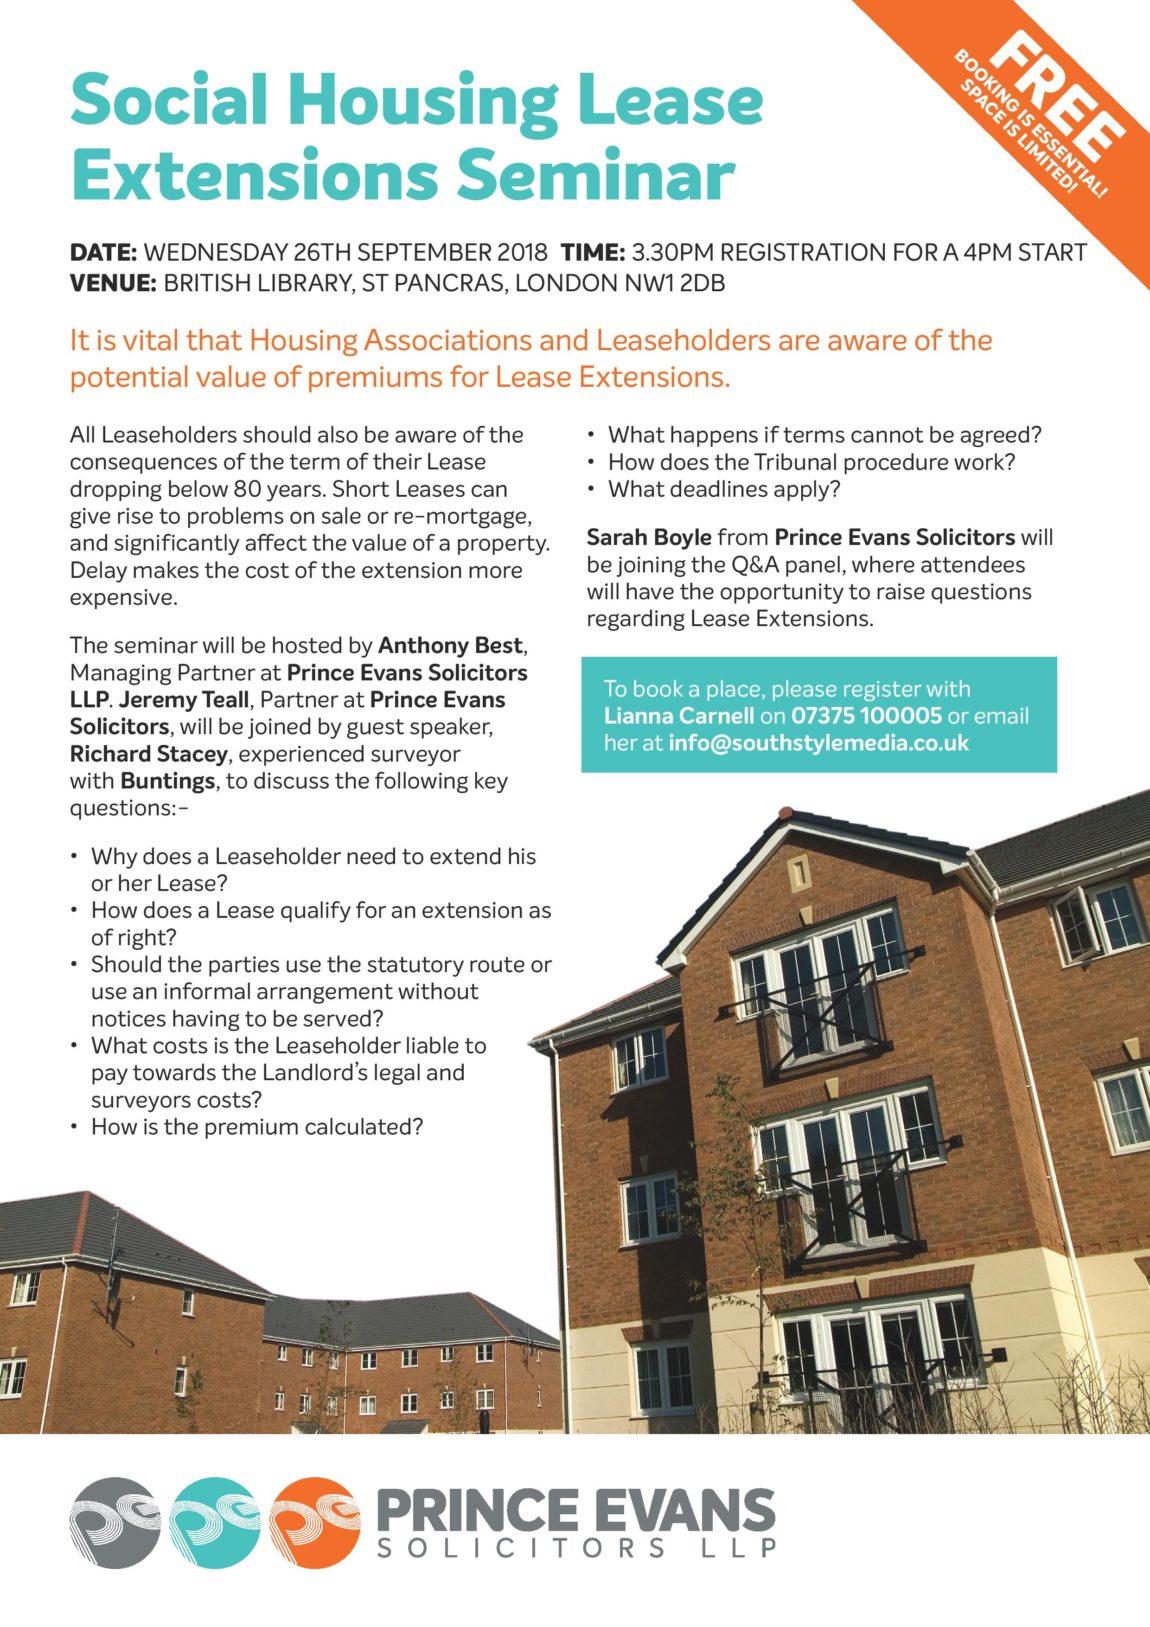 Social Housing Lease Extensions Seminar